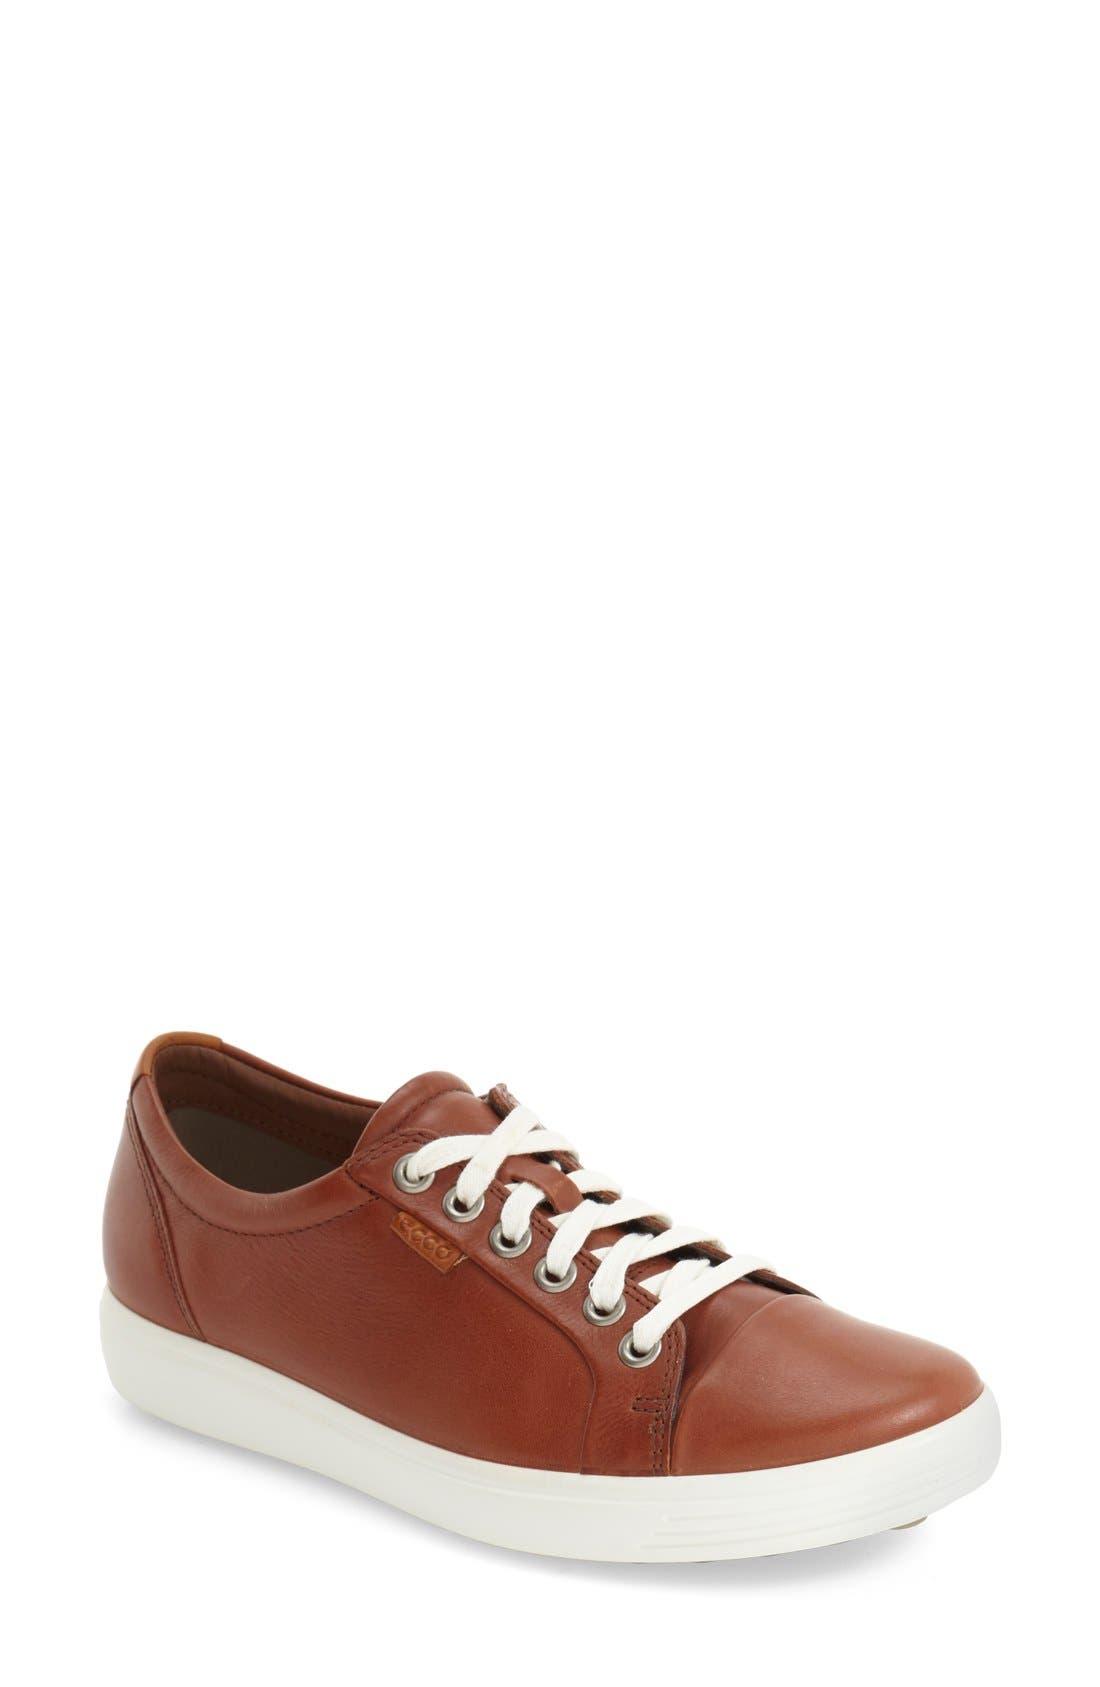 Main Image - ECCO 'Soft 7' Cap Toe Sneaker (Women)